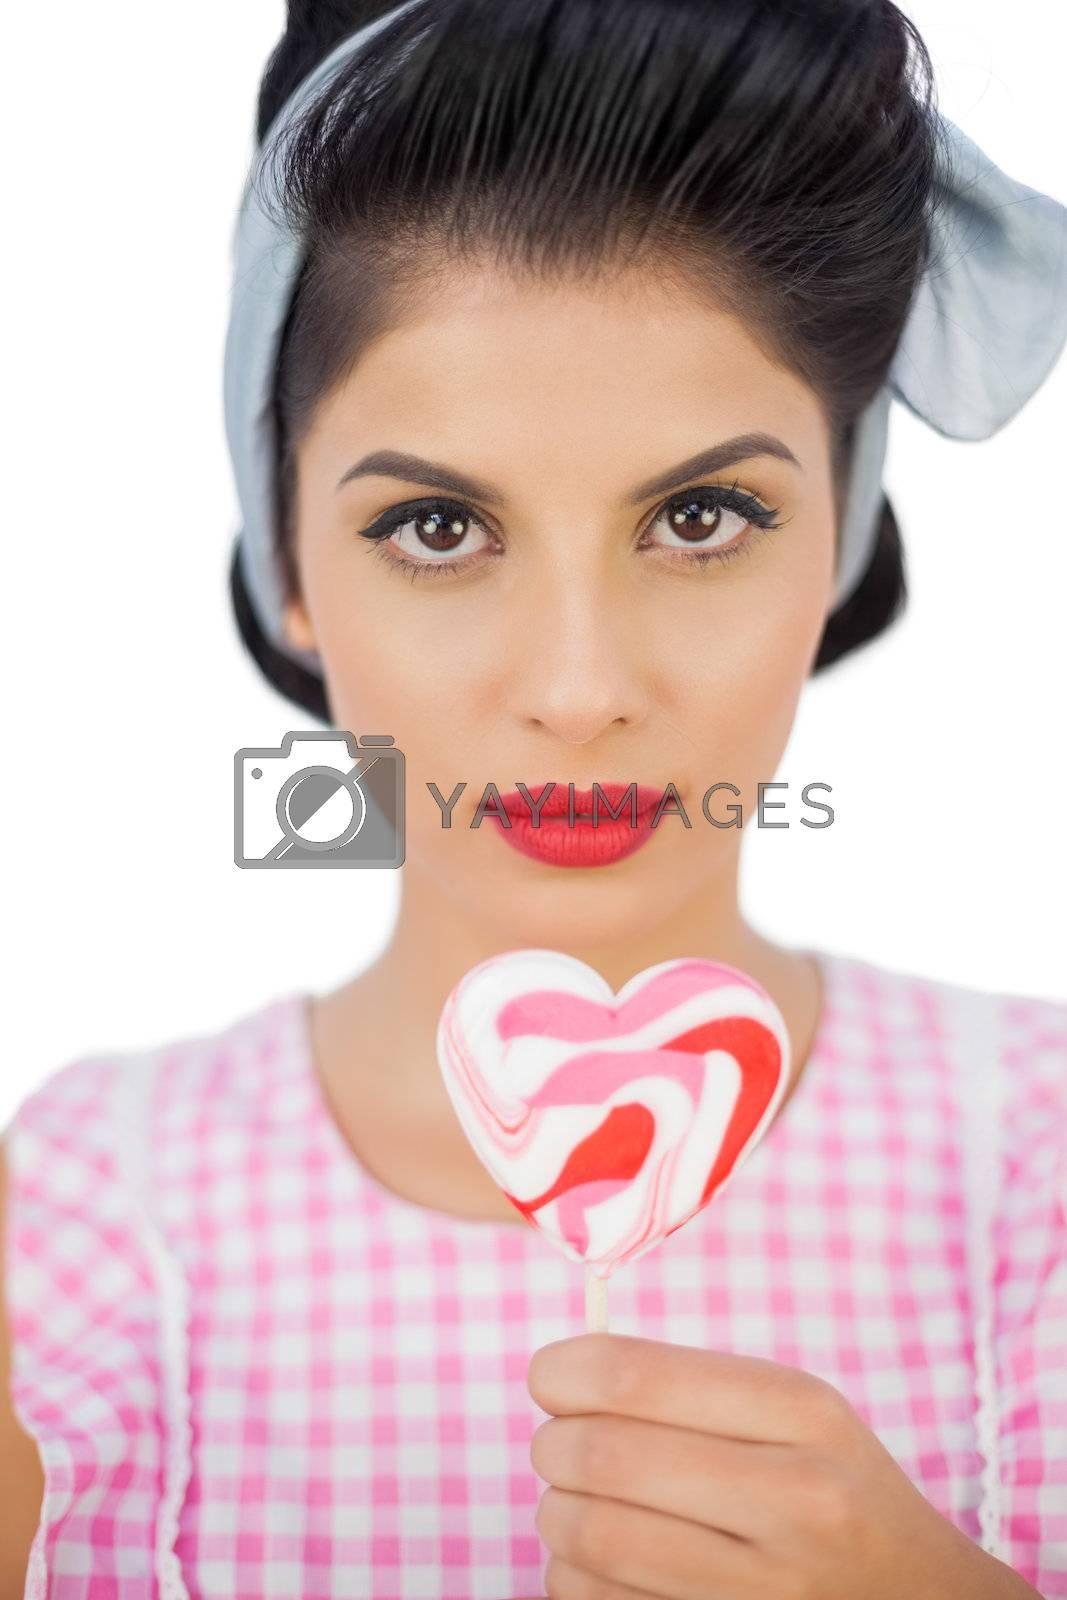 Serious black hair model holding a heart shaped lollipop by Wavebreakmedia